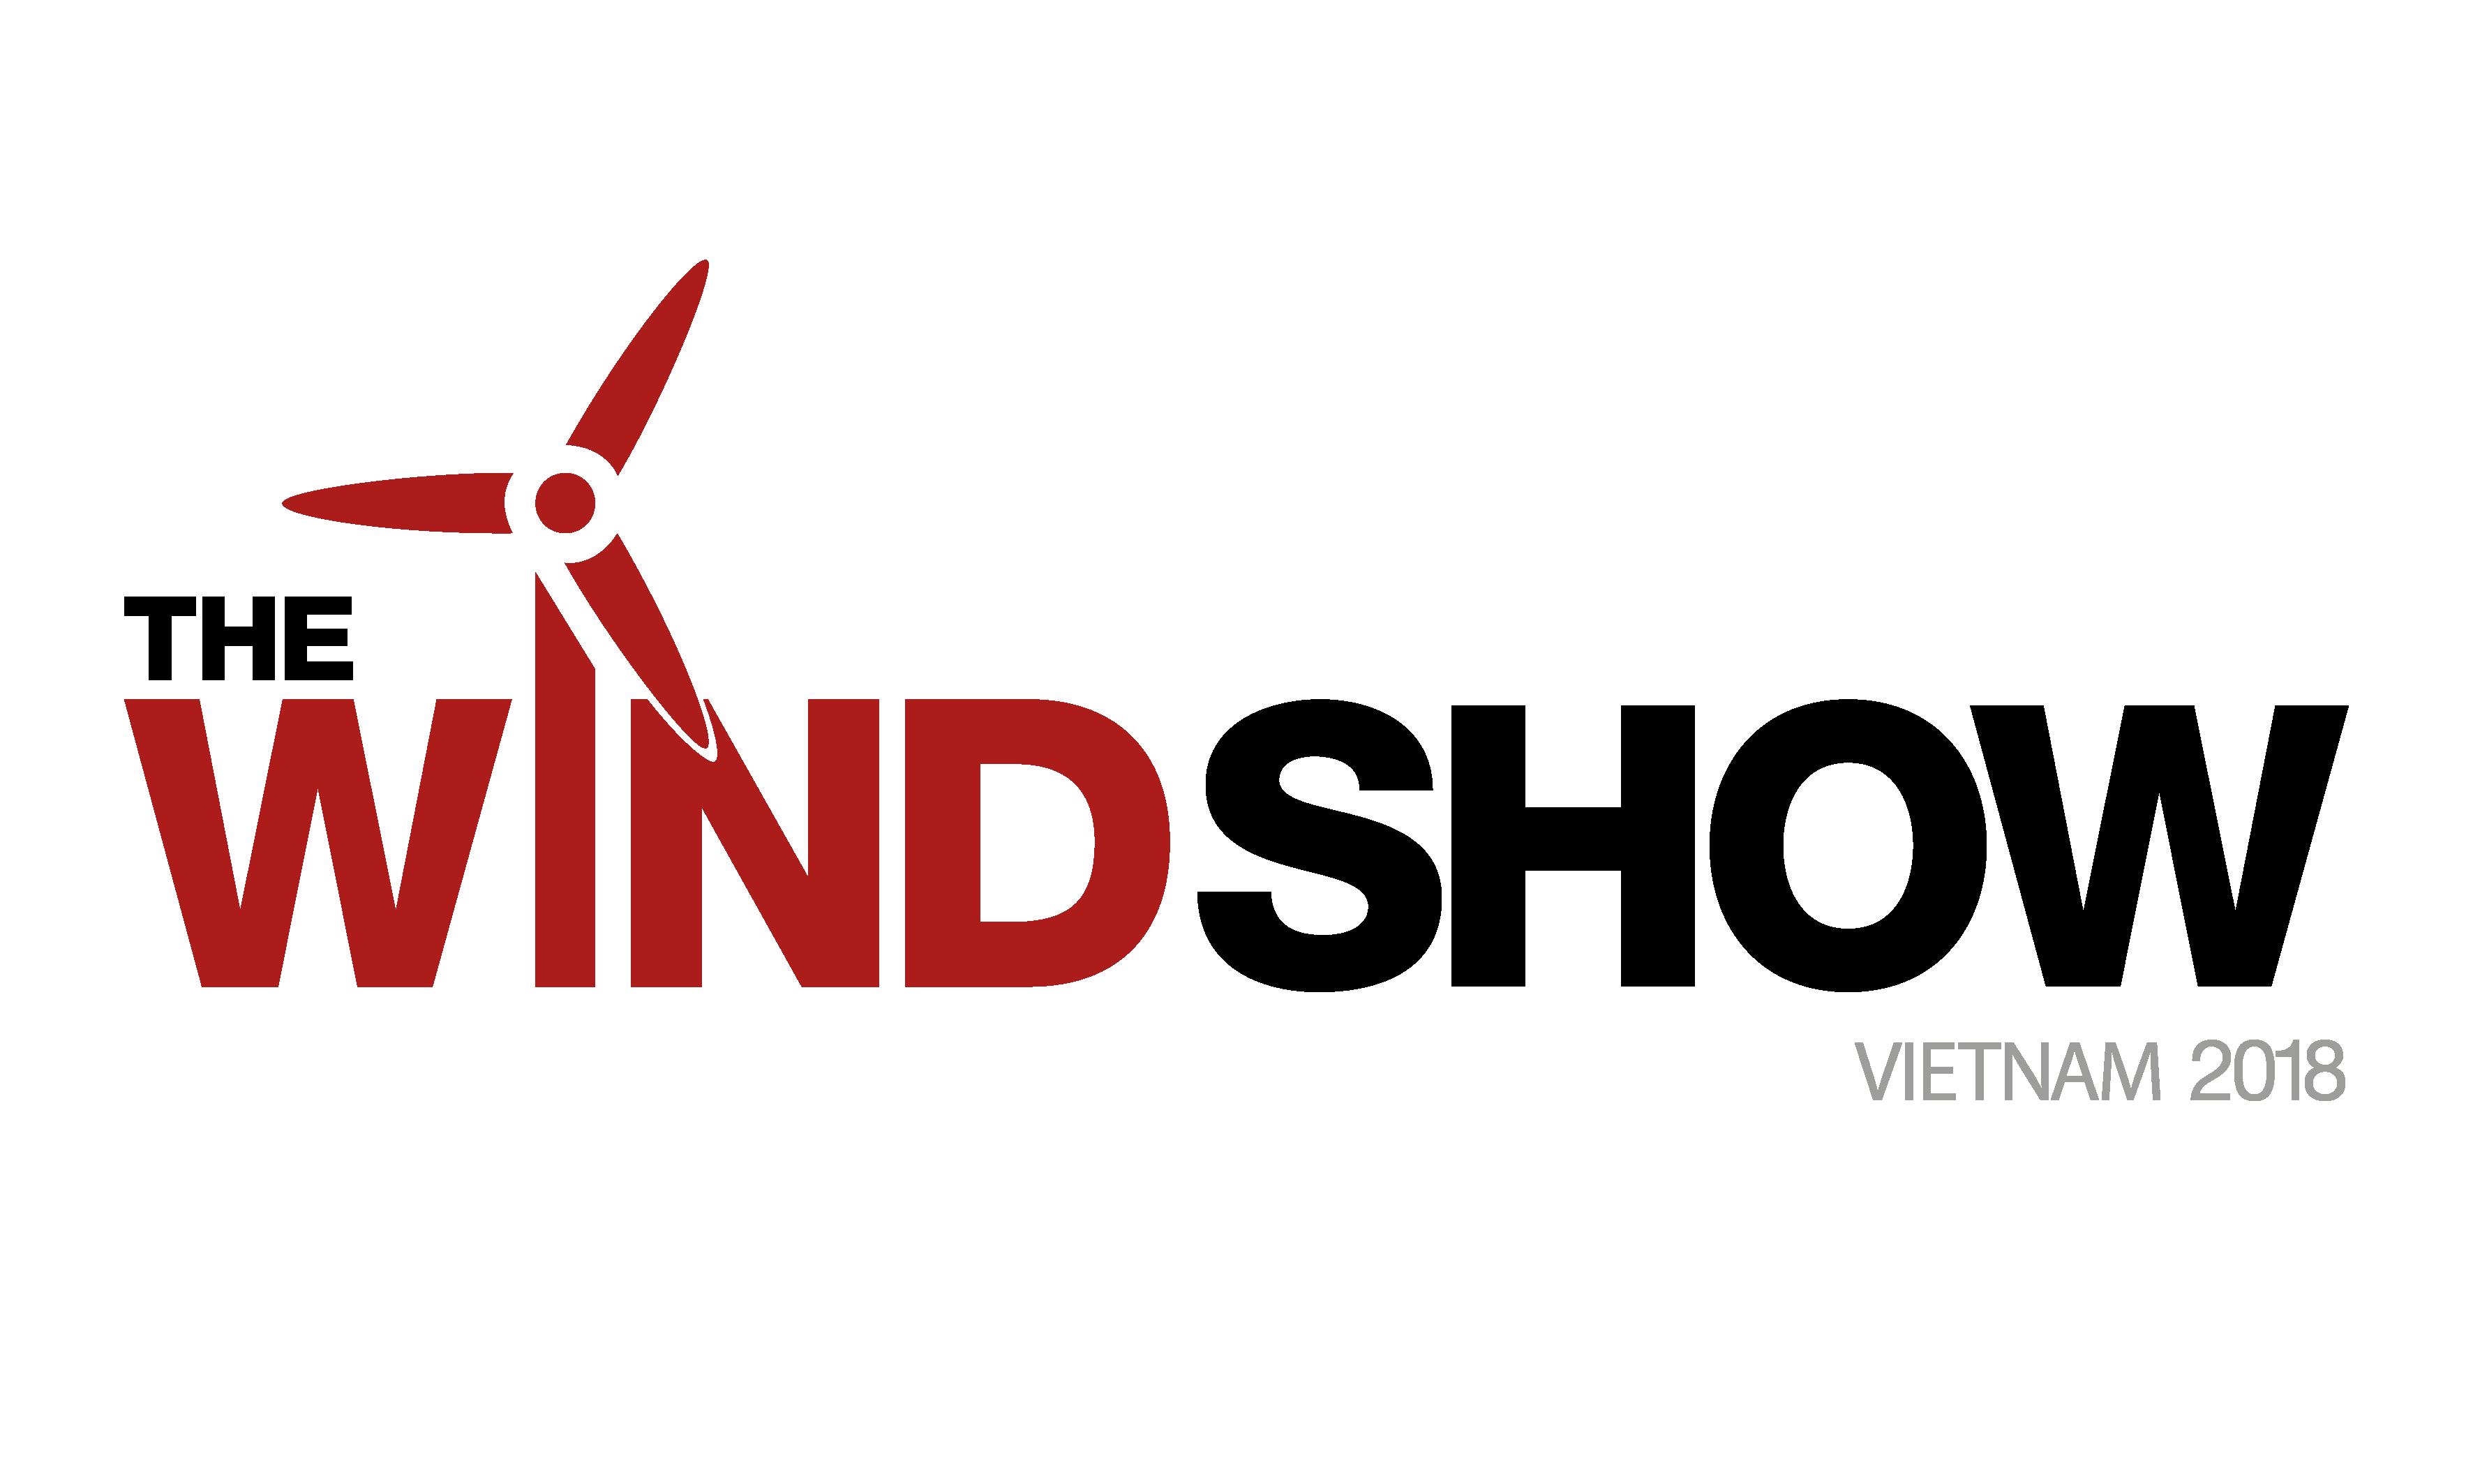 The Wind Show Vietnam 2018 logo - EPS